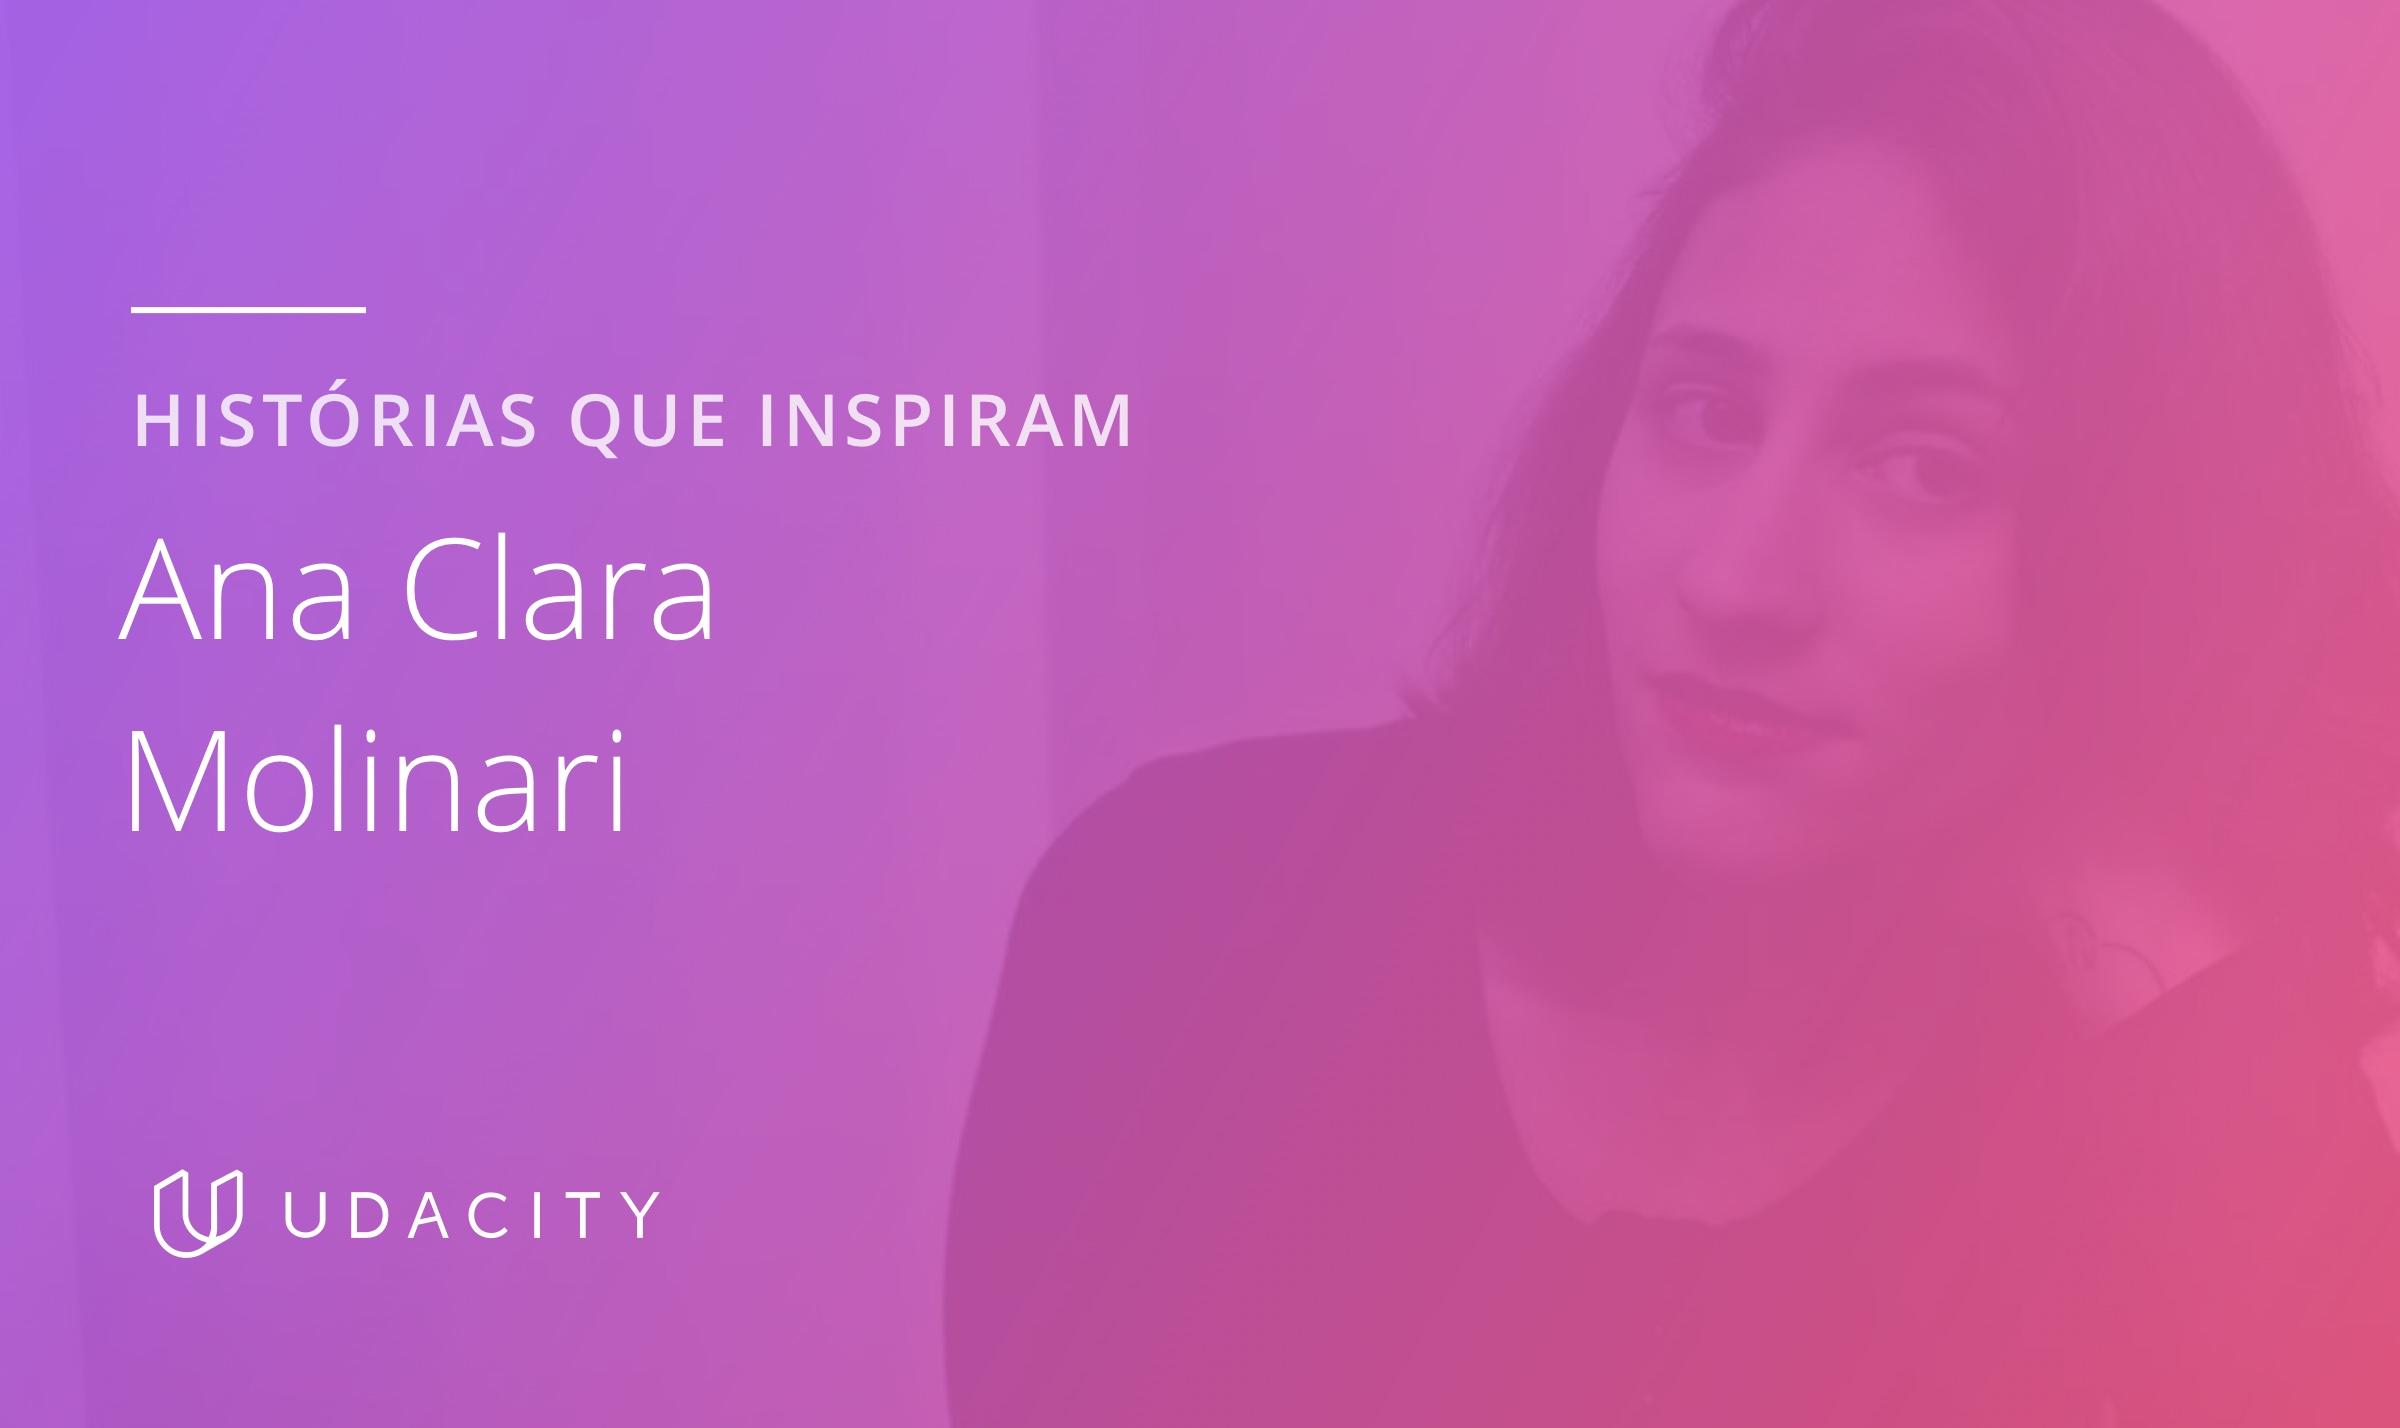 Ana Clara Molinari